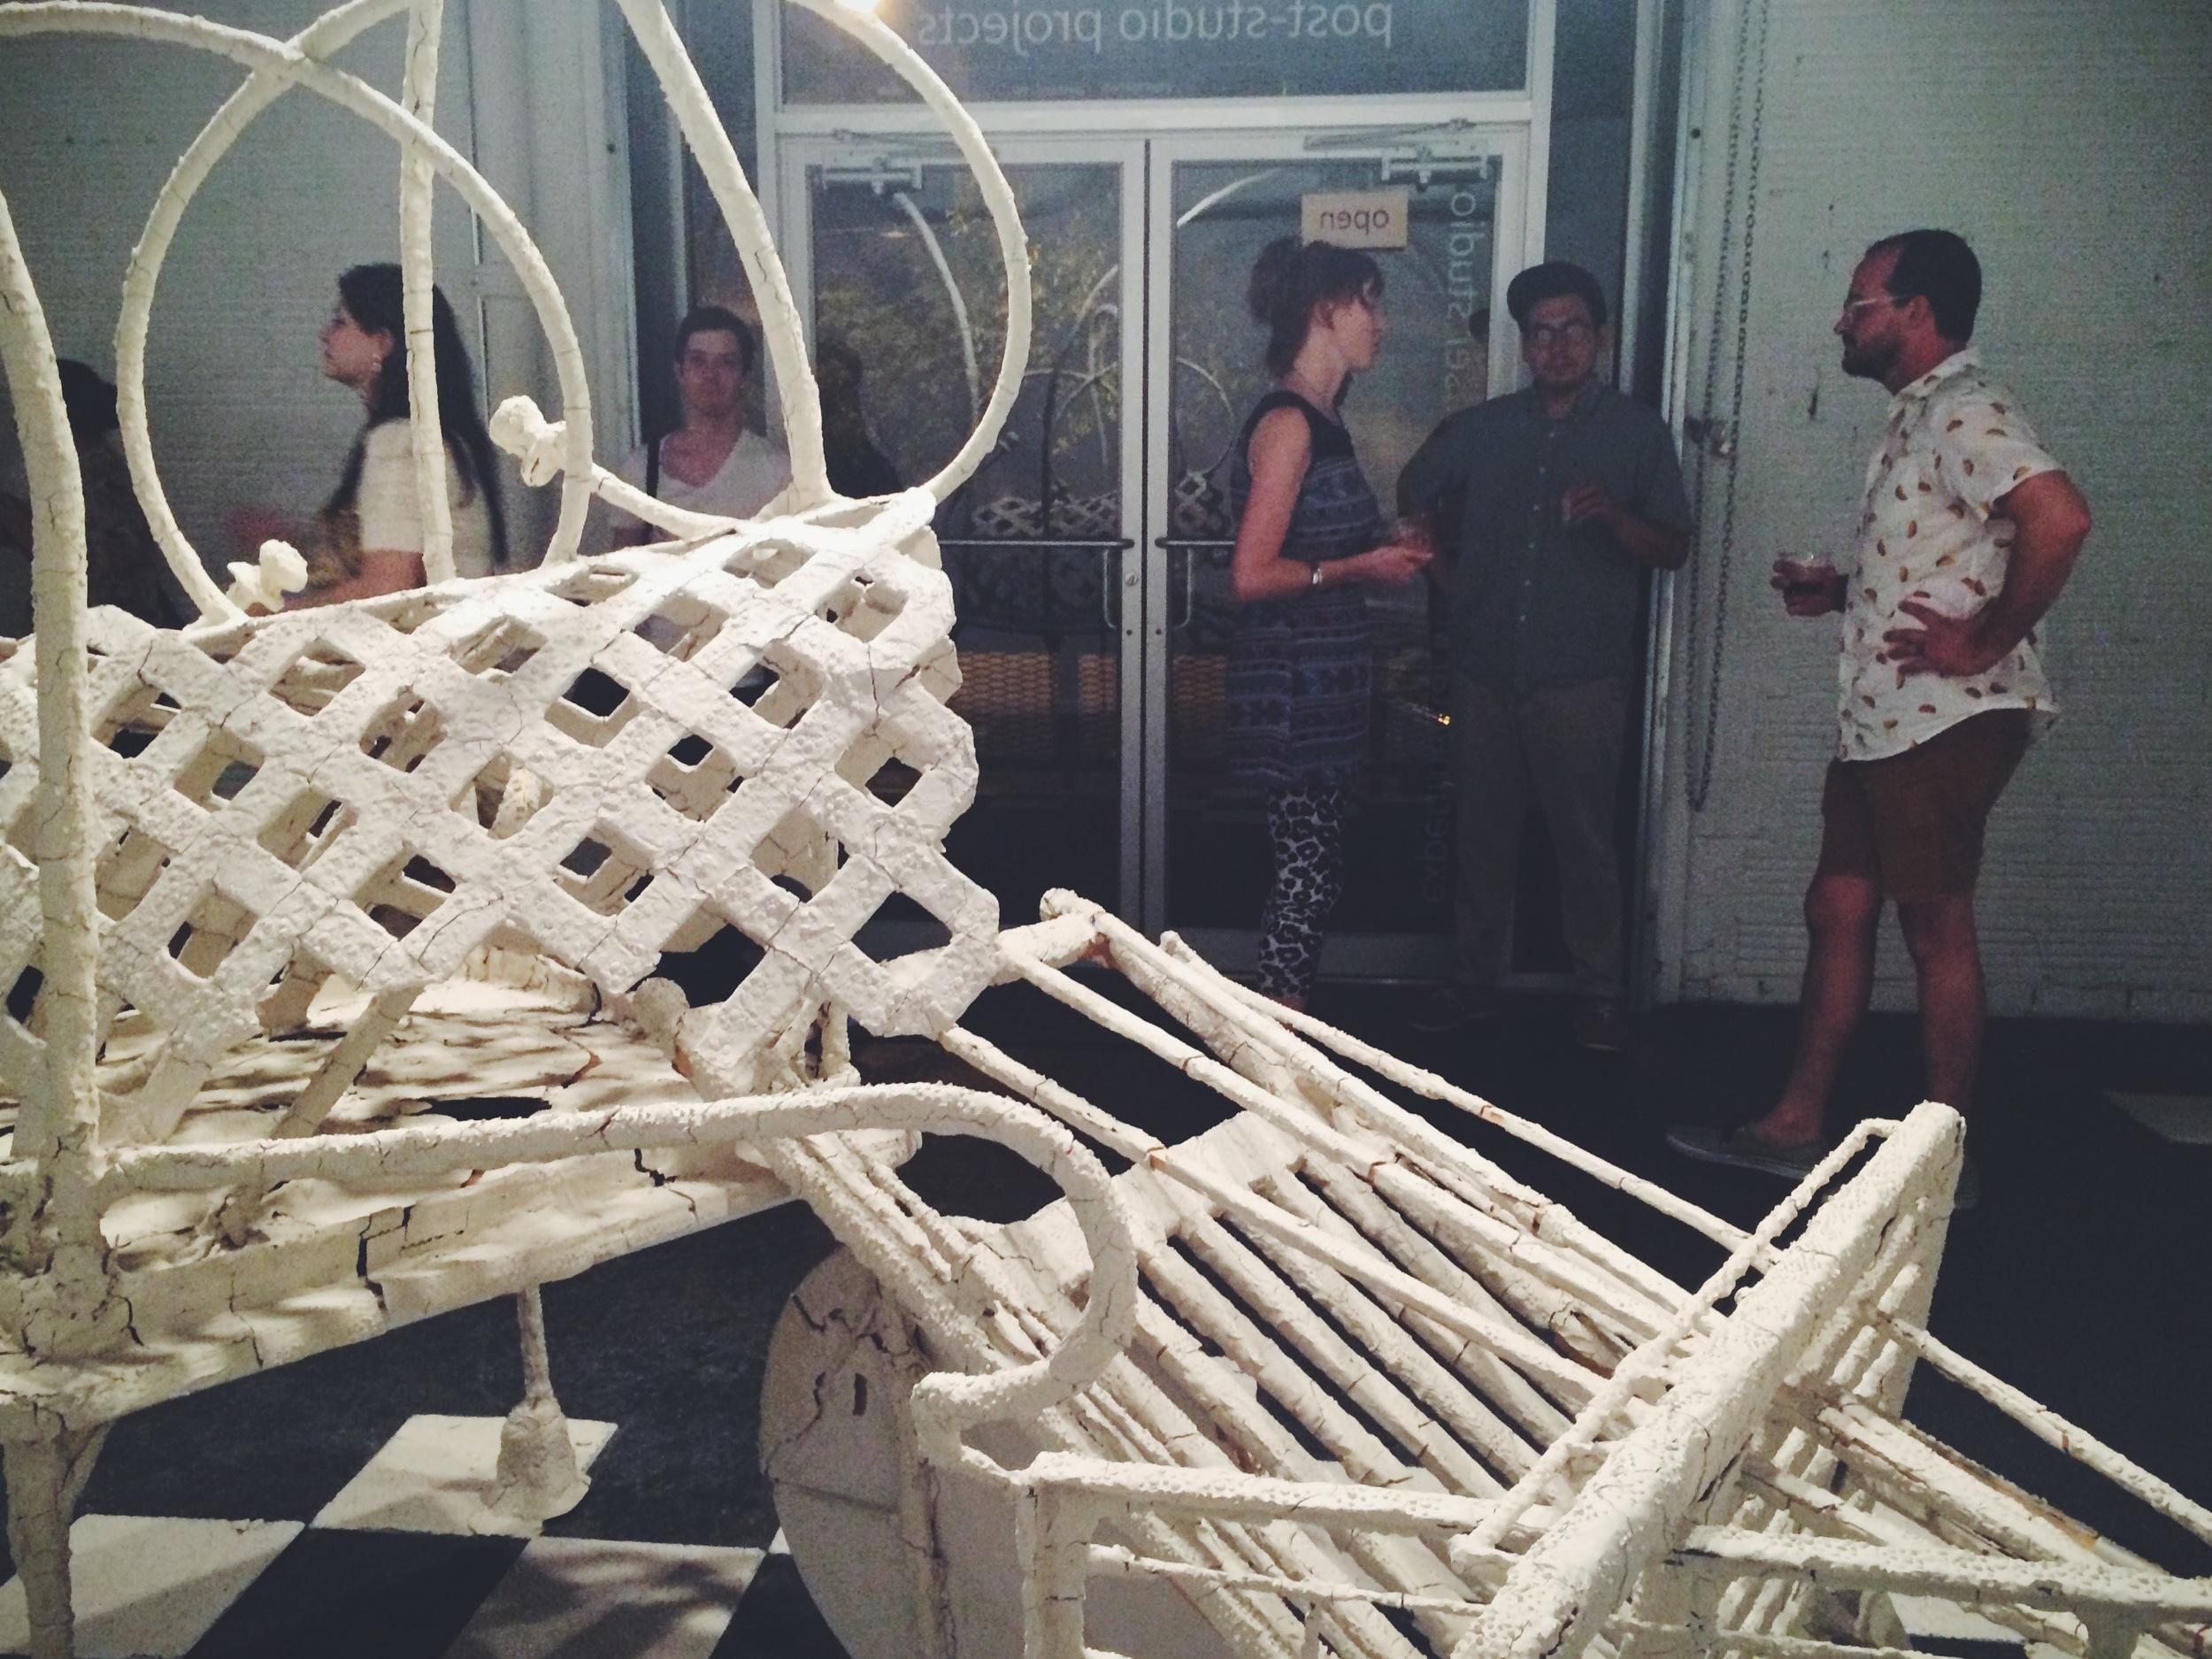 Jessica Kreutter / Post Studio Projects, Houston